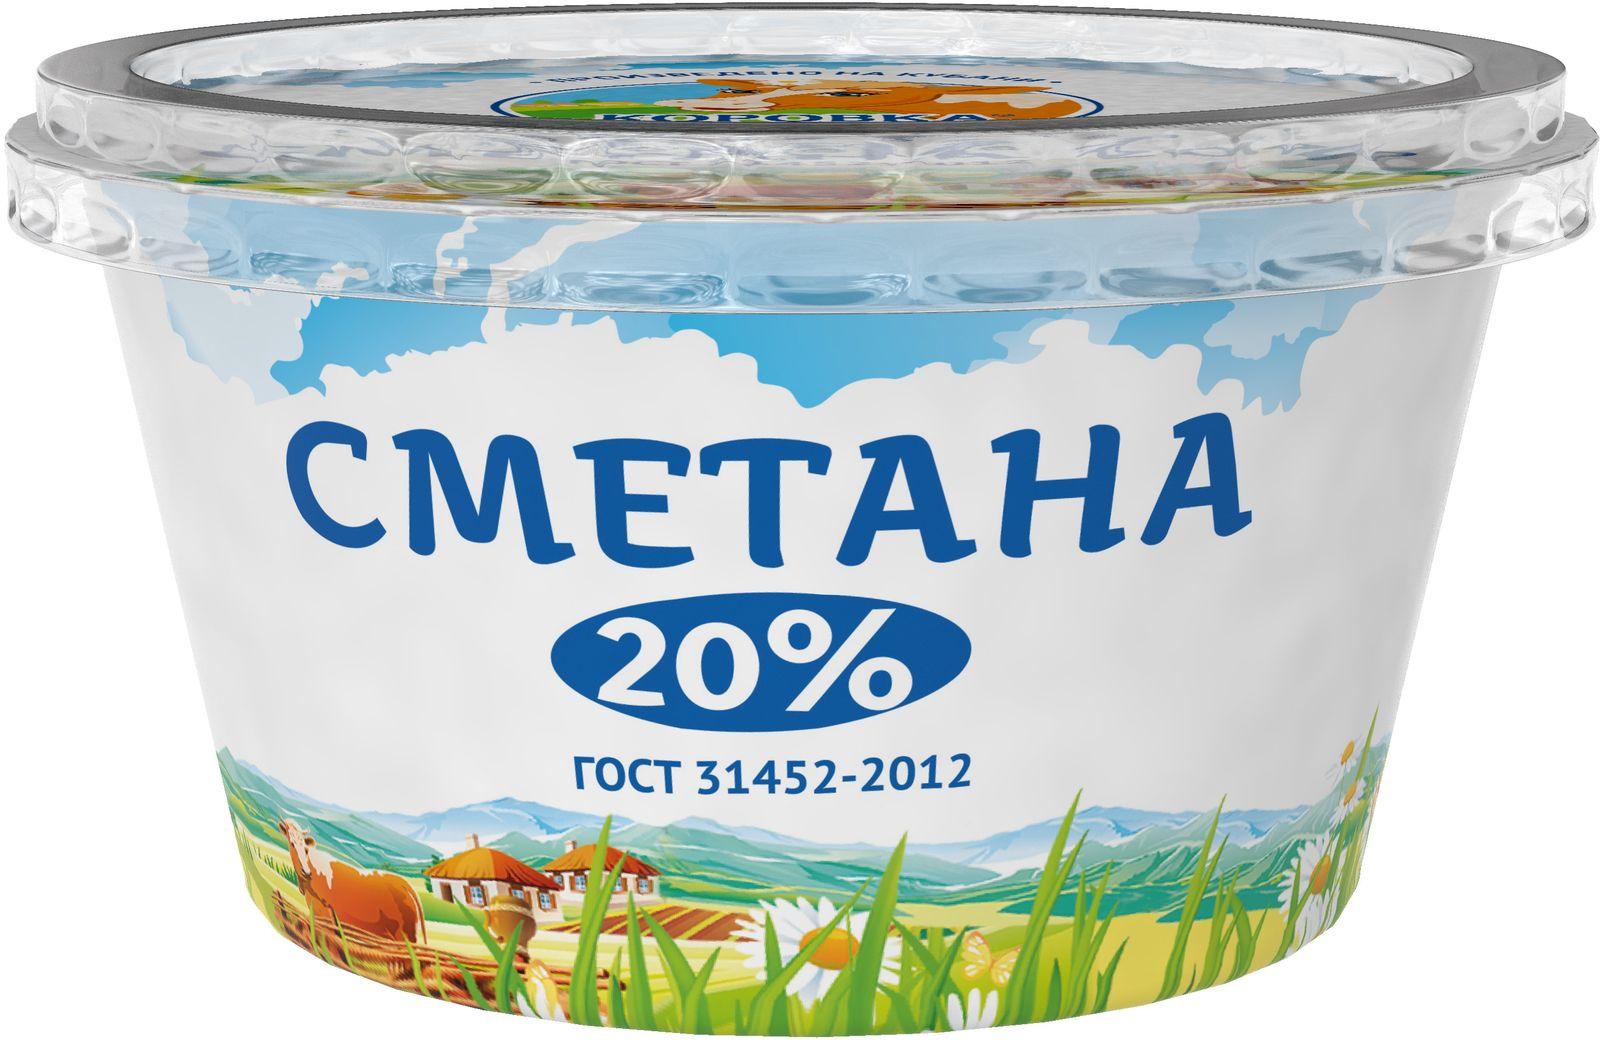 Сметана Коровка из Кореновки, 20%, 180 г простоквашино сметана 20% 315 г